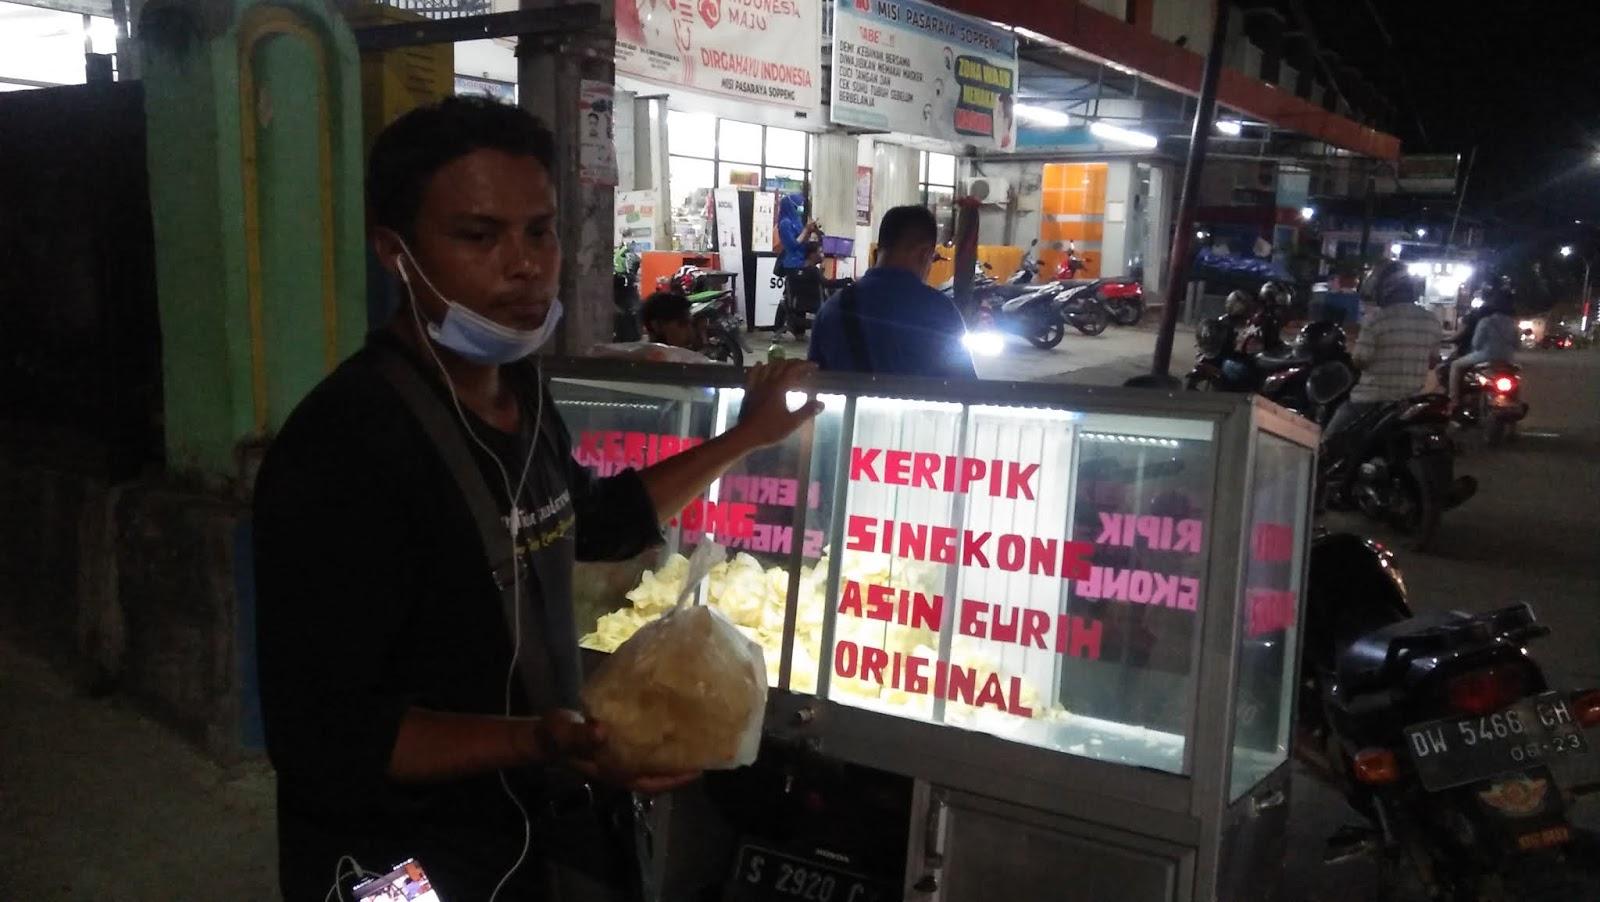 Pedagang Keripik Singkong : Soppeng Aman Mas